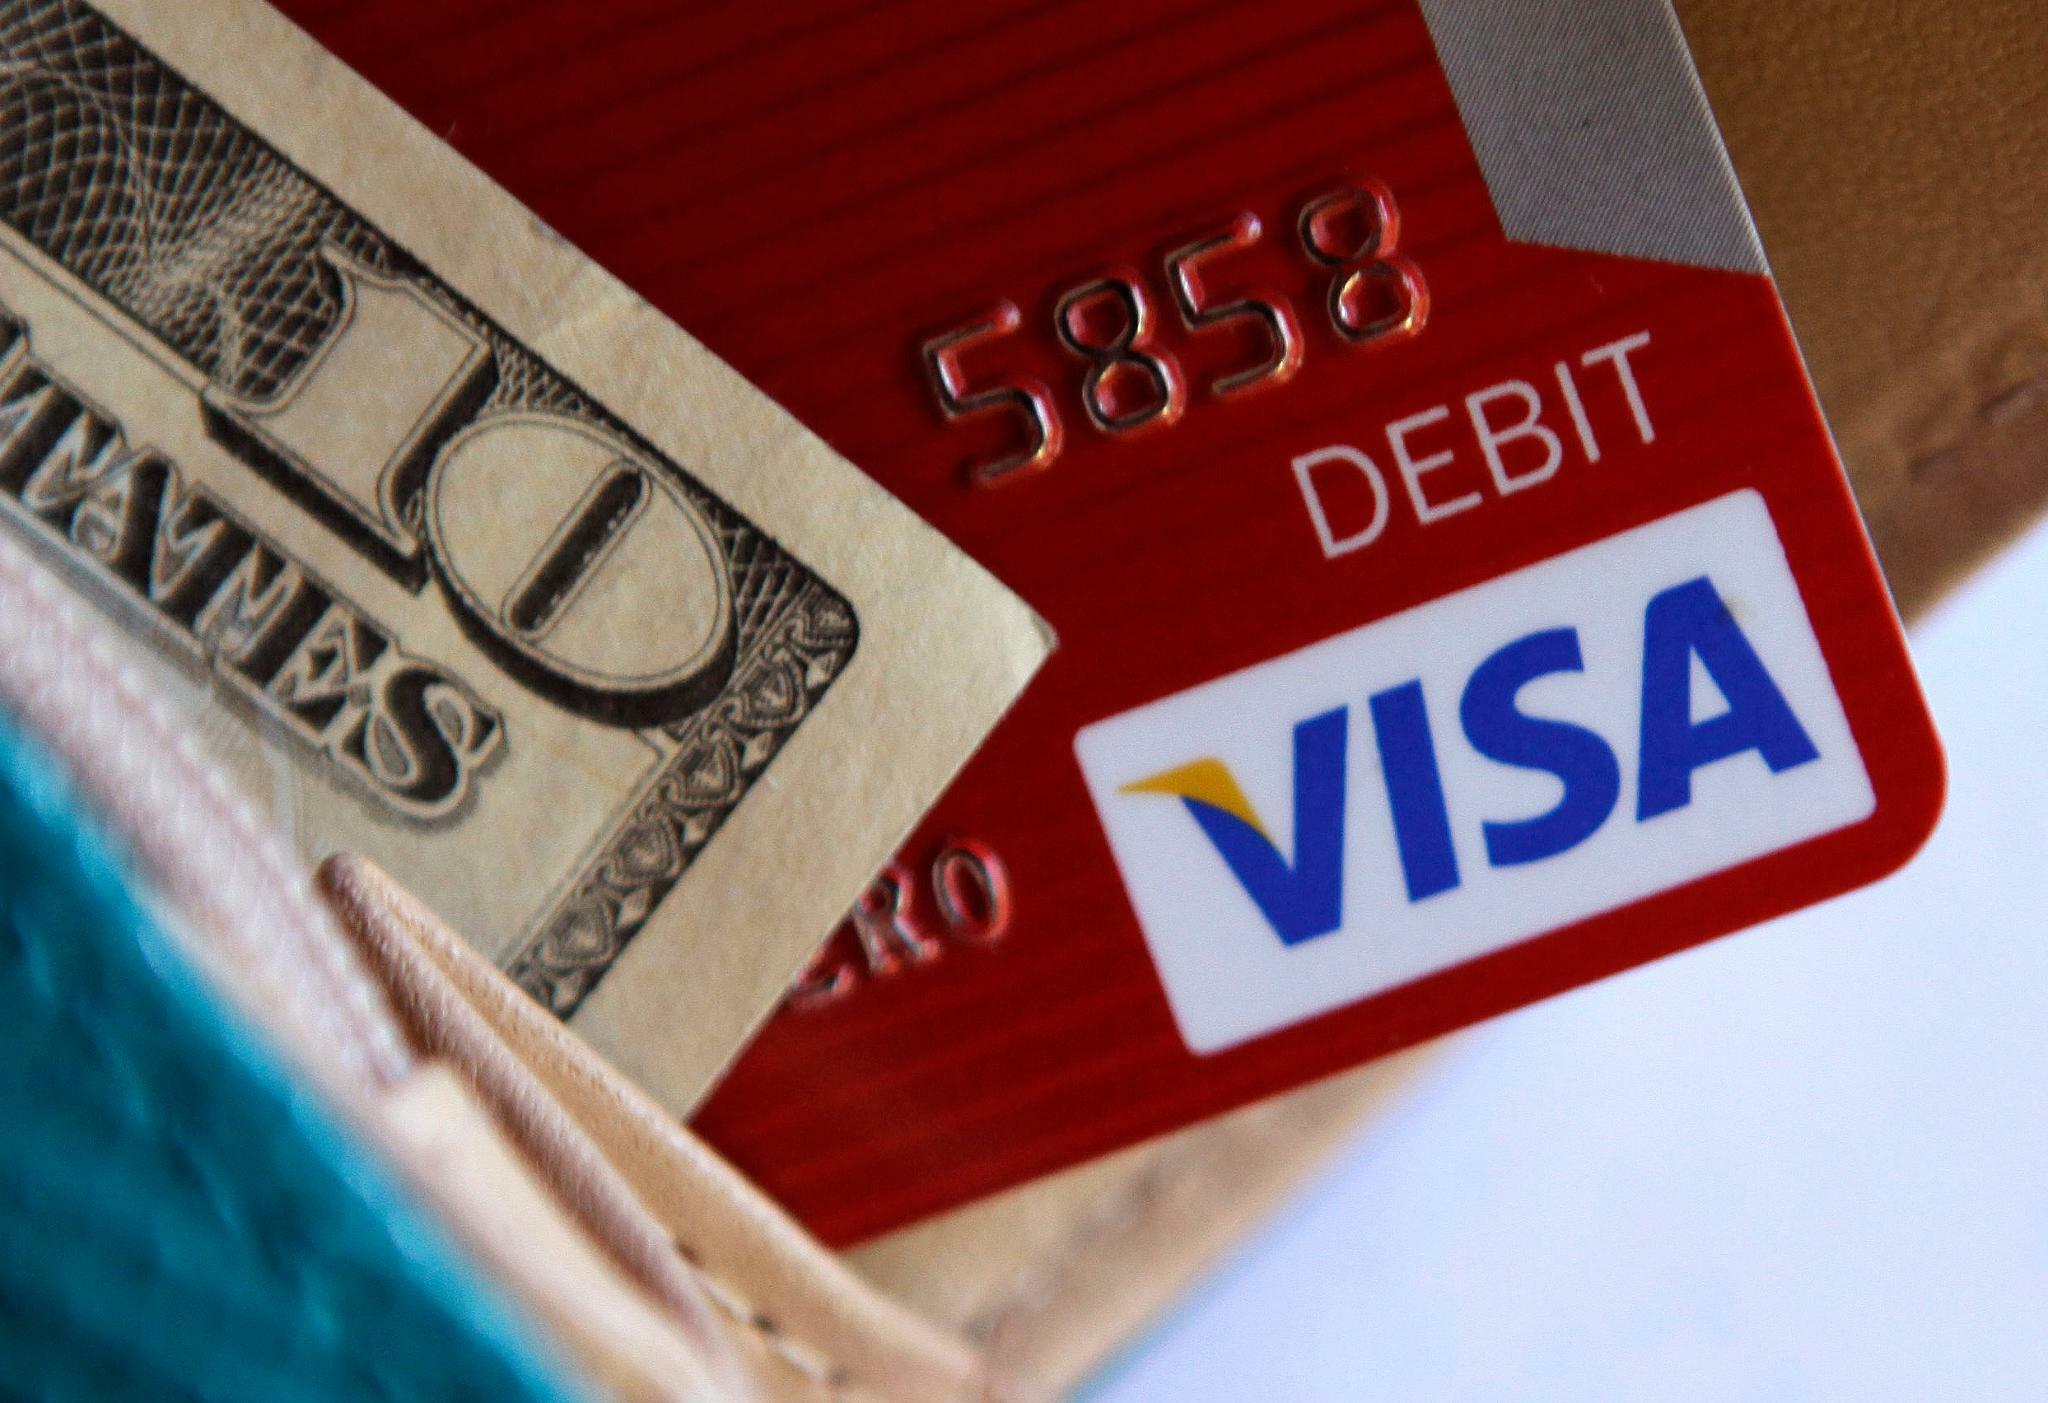 Visa will mit eigener Debit-Karte den Banken Konkurrenz machen